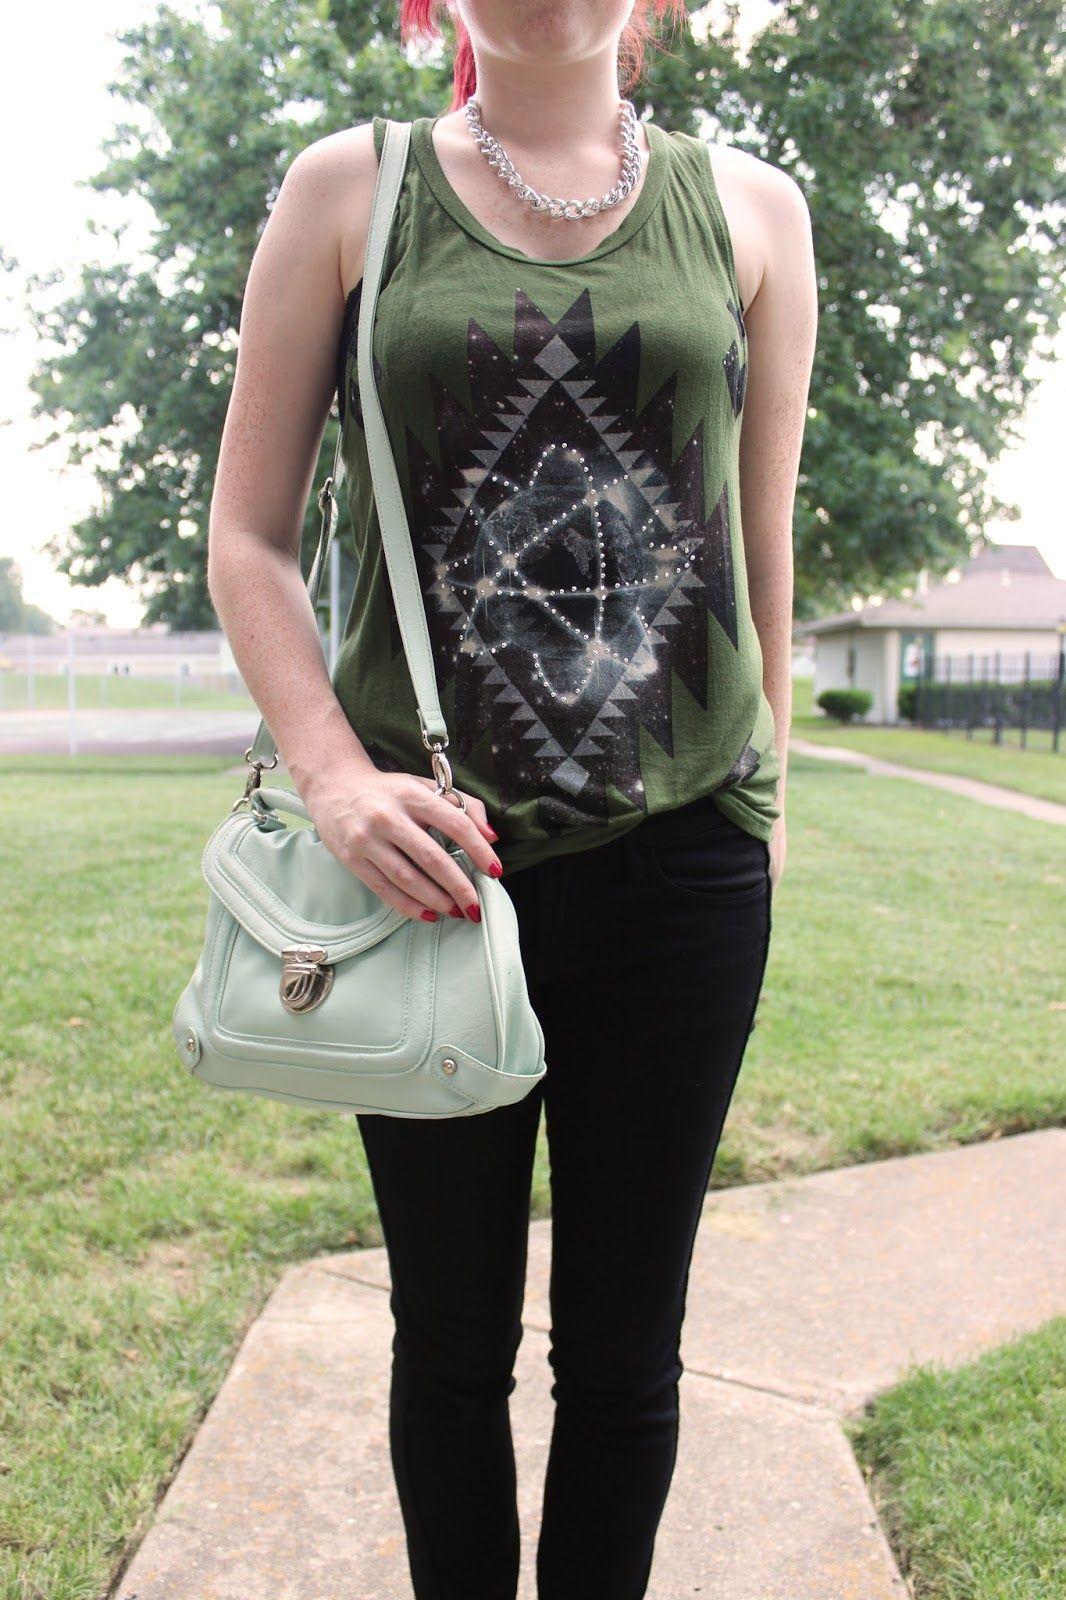 Galaxy Muscle :: Encourage Fashion